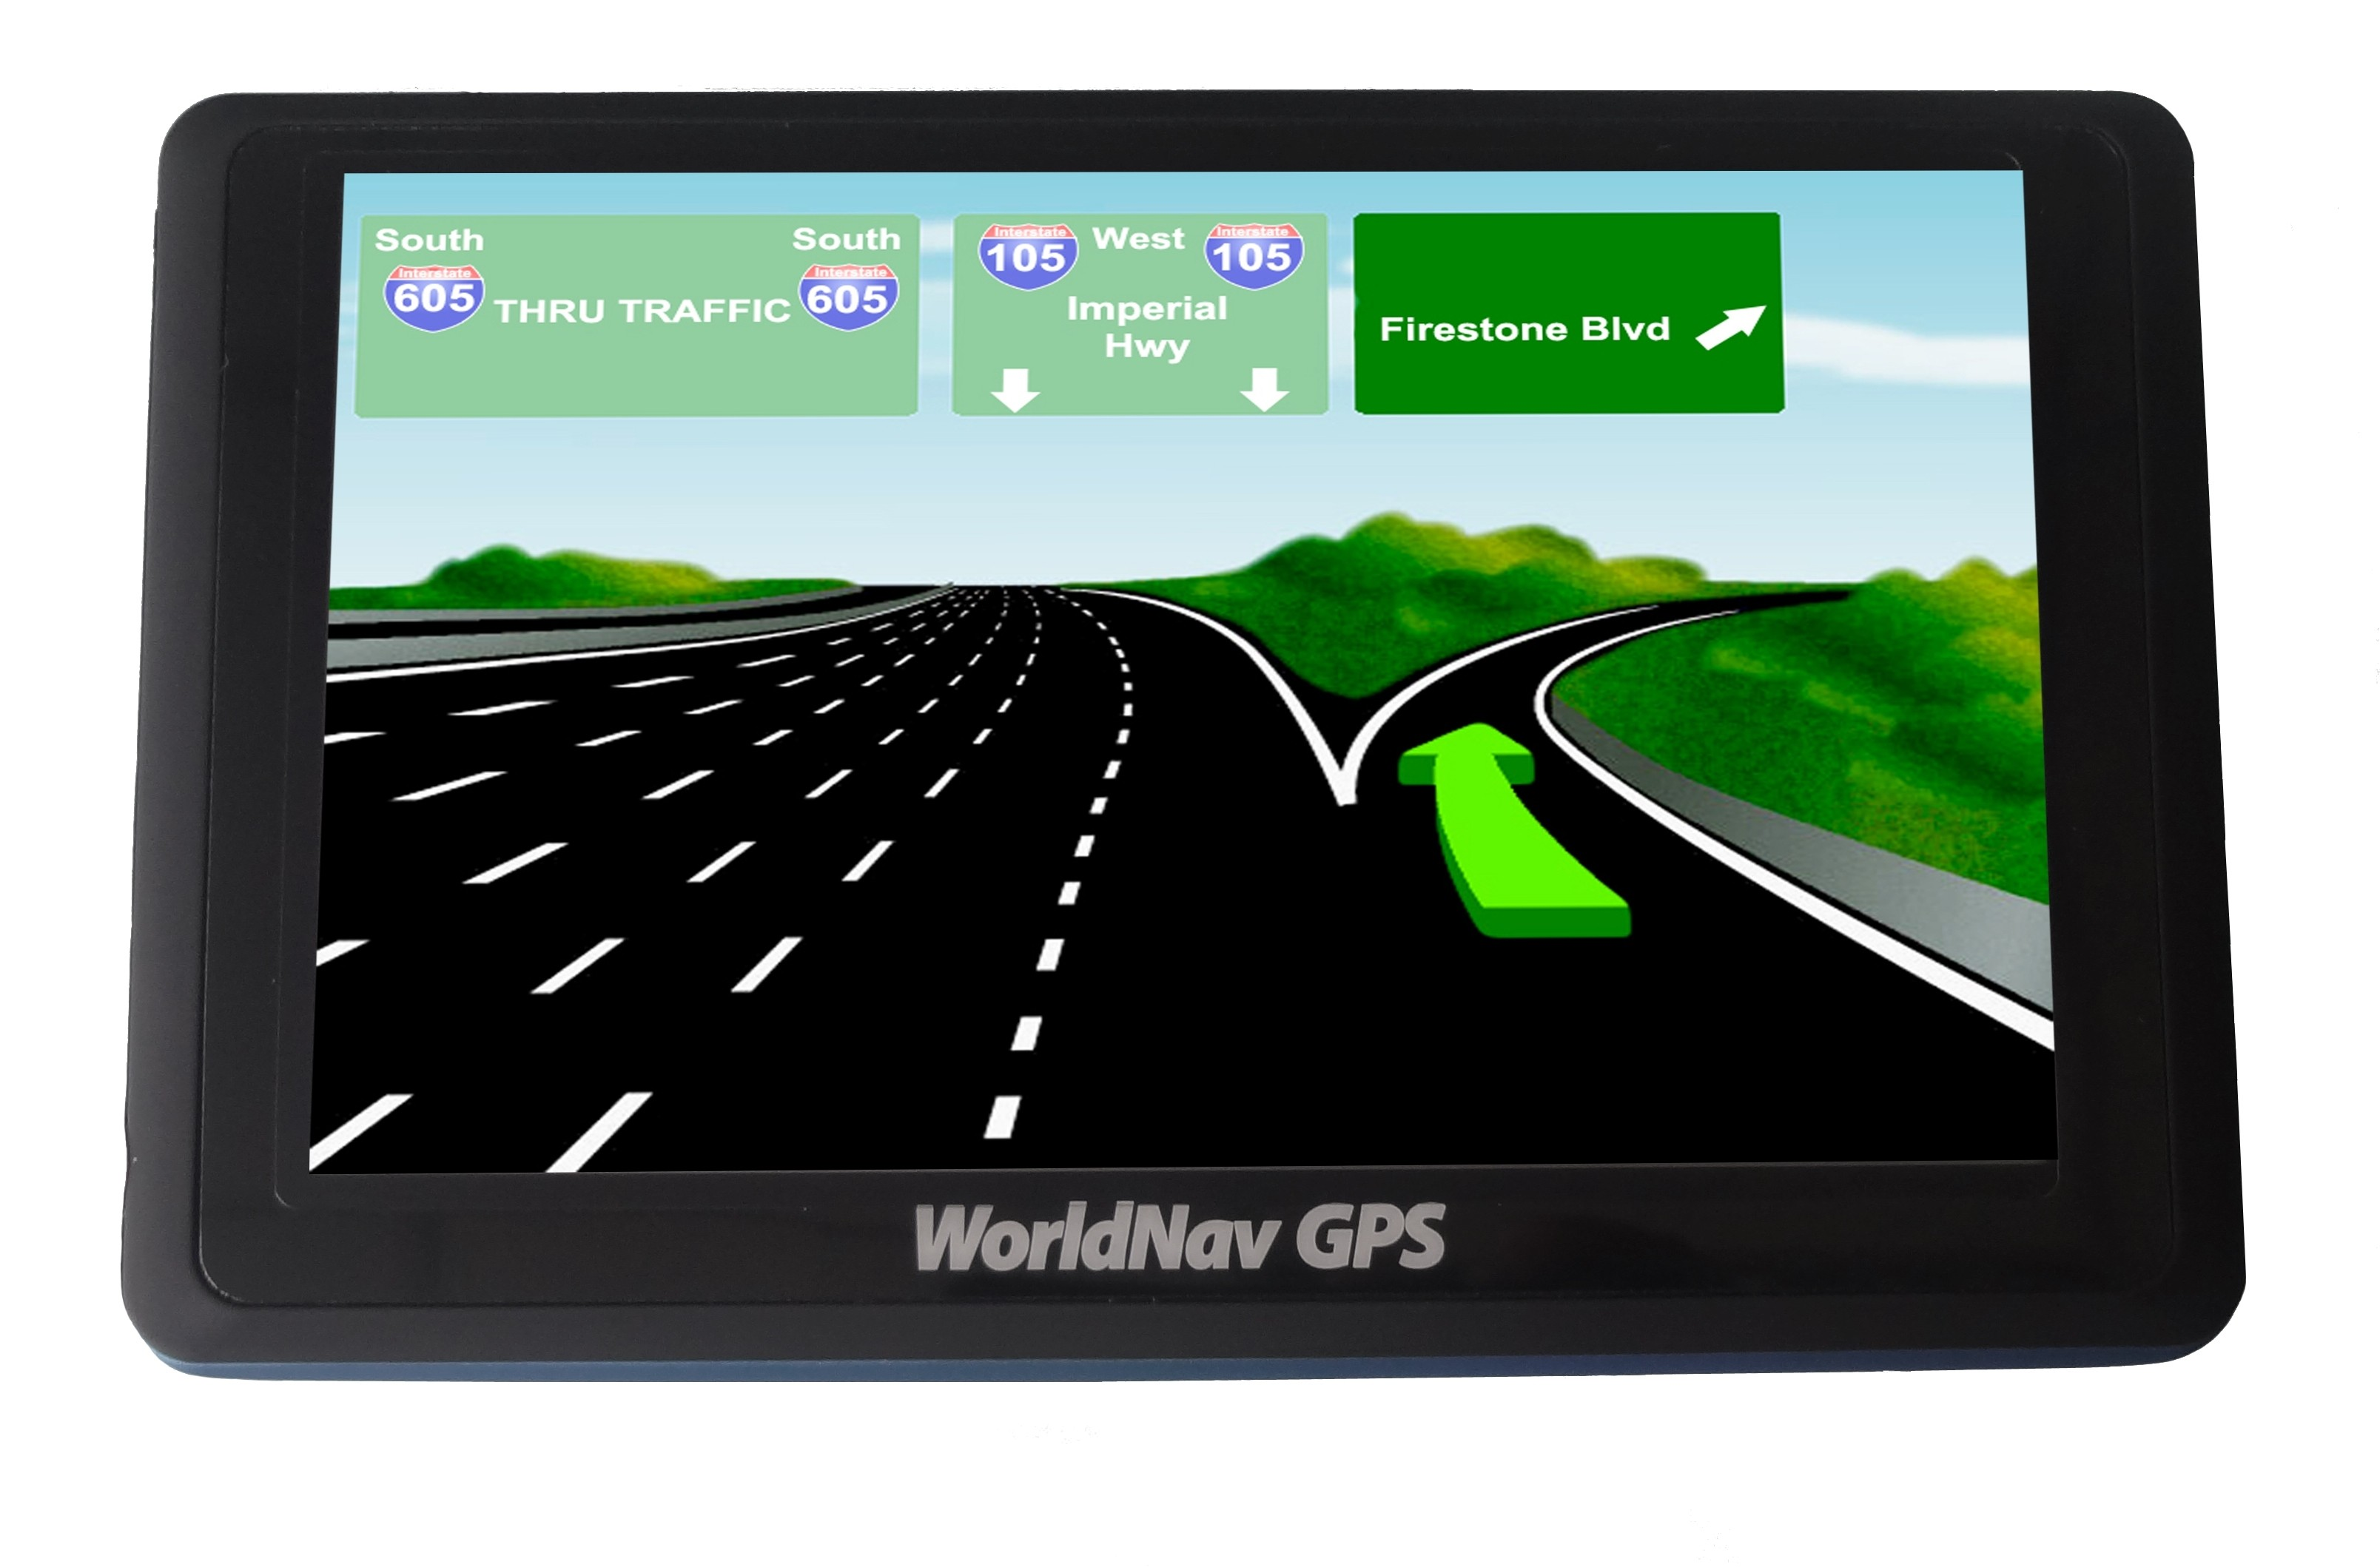 "WorldNav 5"" Truck GPS - 5880 Refurbished (1 year warranty!) - Holiday Special!"